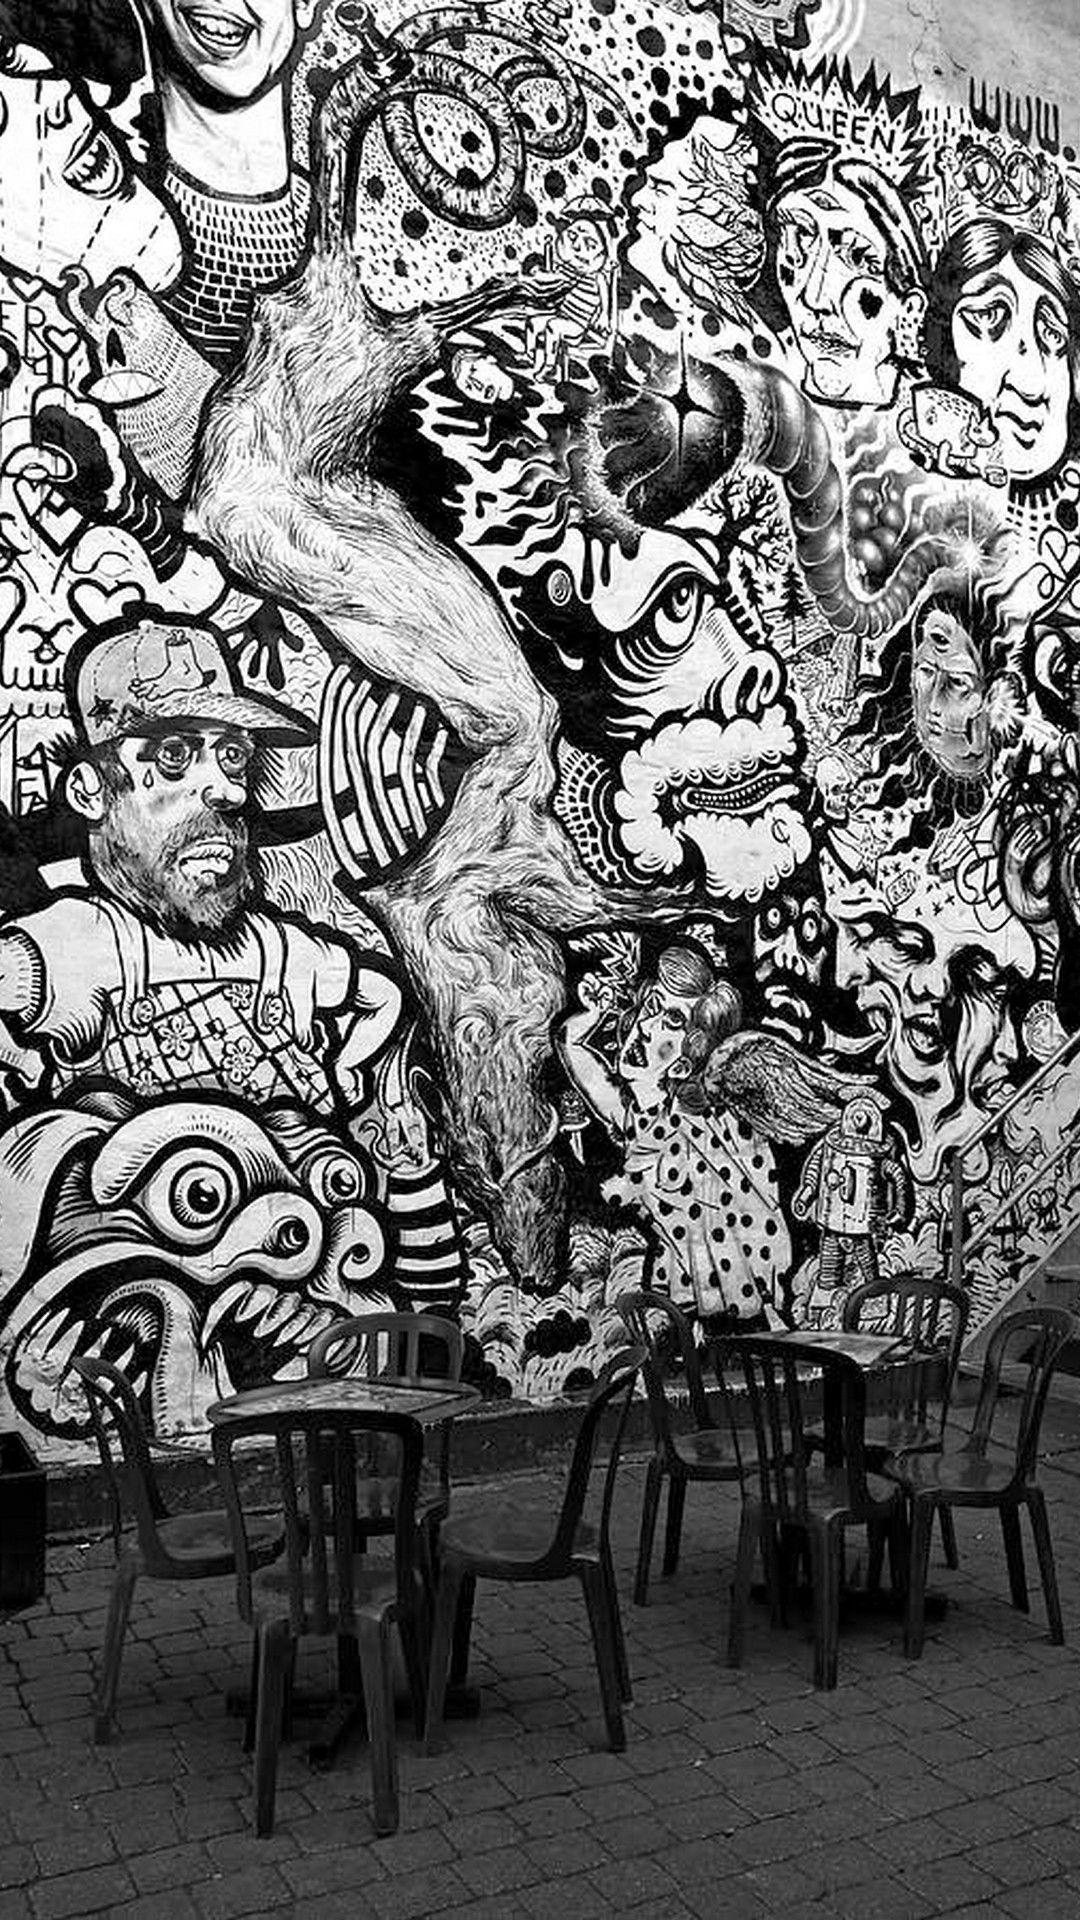 Graffiti Art Wallpaper Android 2019 Android Wallpapers Arte Urbano Arte Urbano